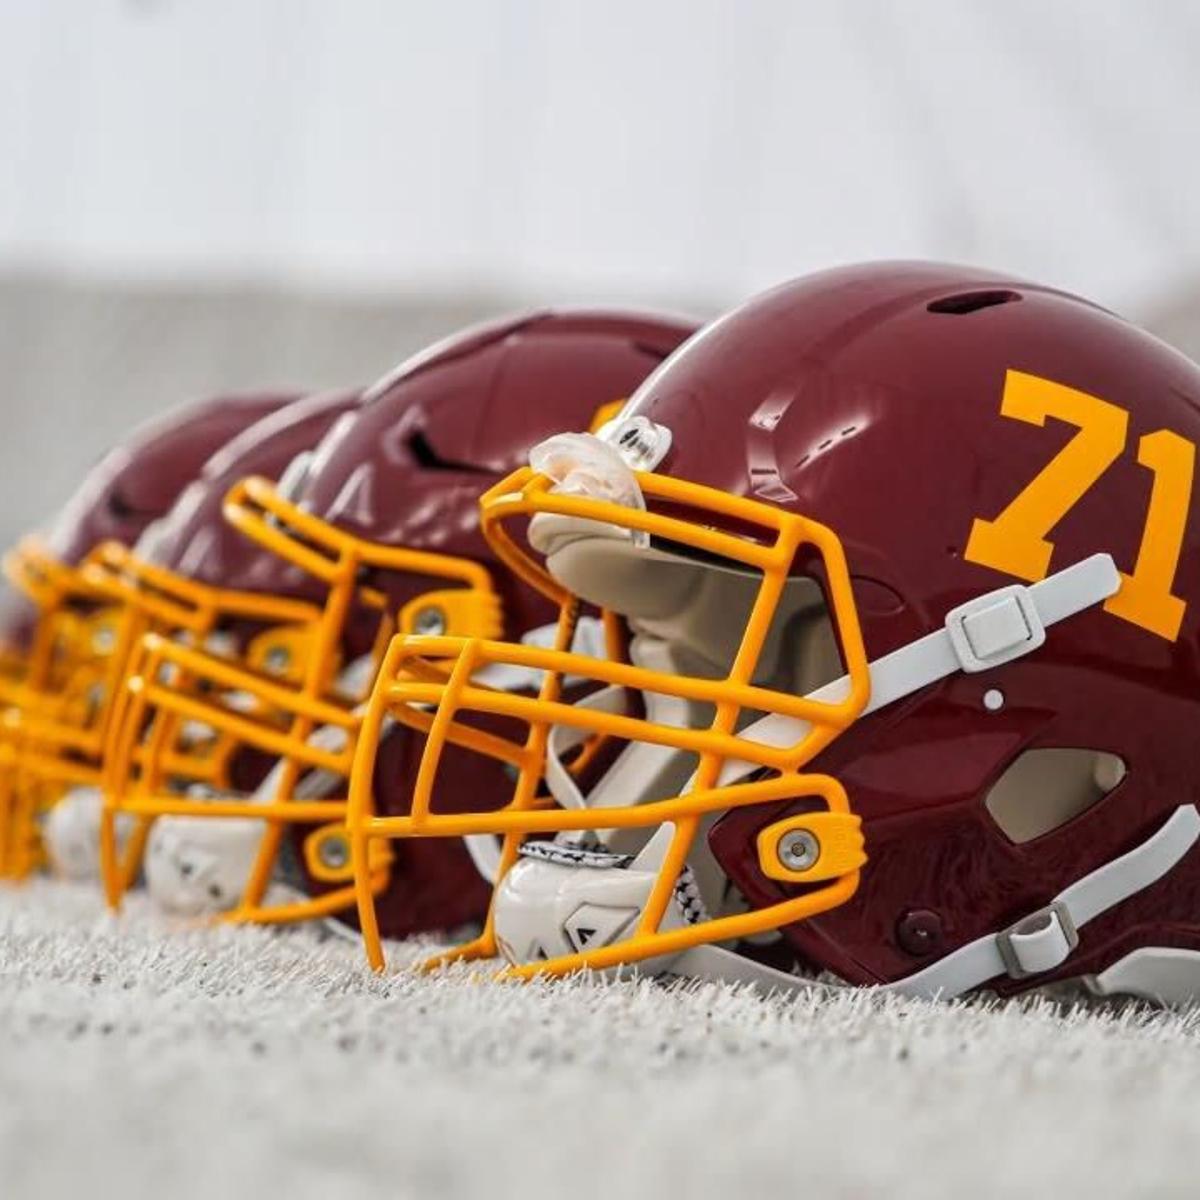 New Helmets New Attitude As Rebranded Washington Football Team Takes The Field Professional Sports Richmond Com